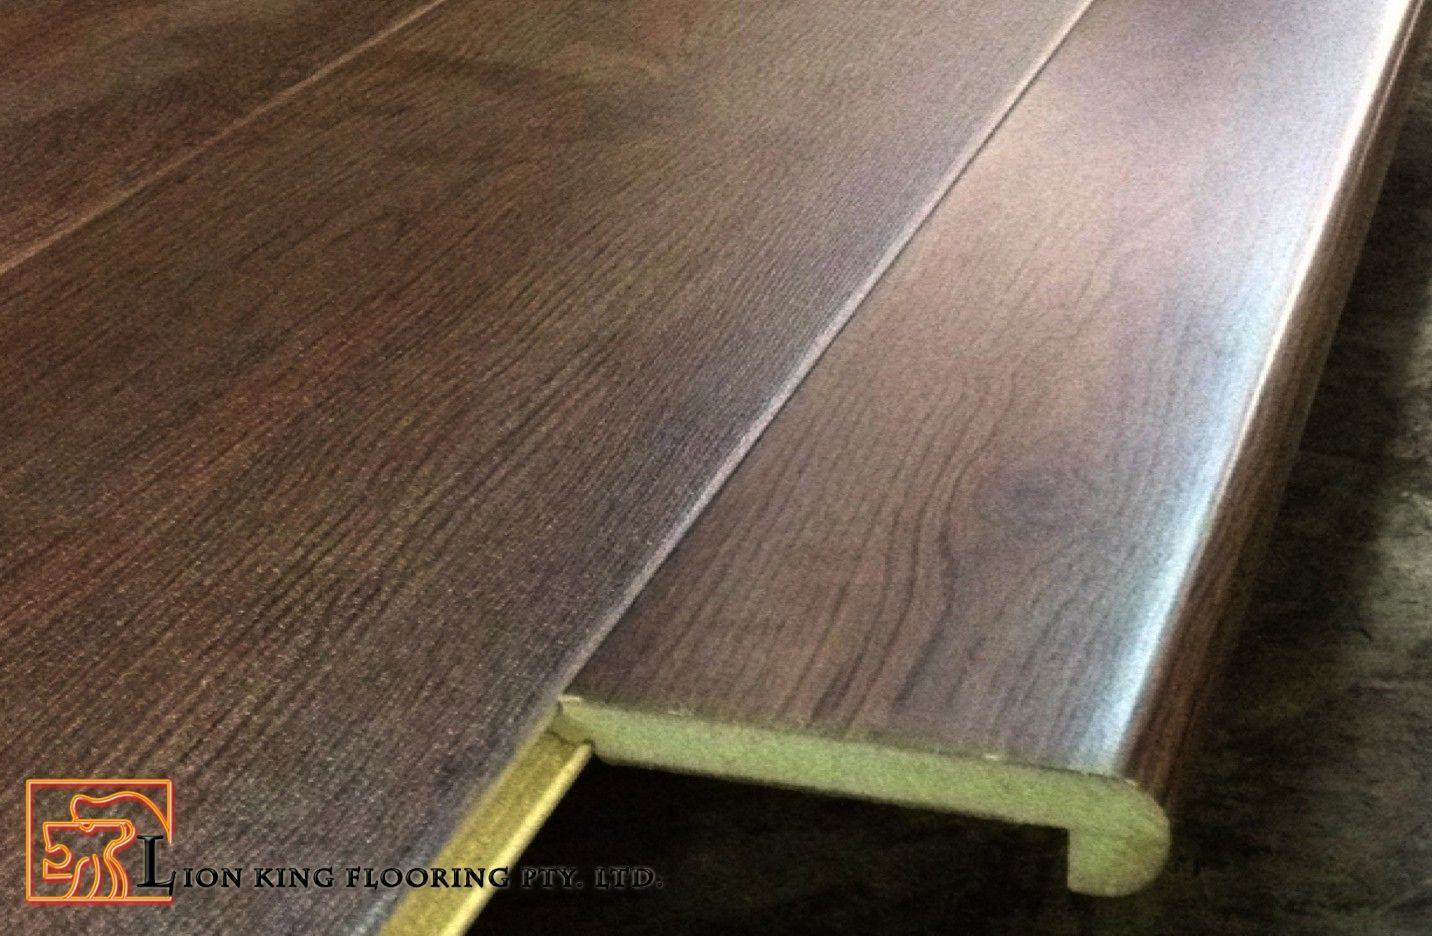 Stair Edging For Laminate Flooring